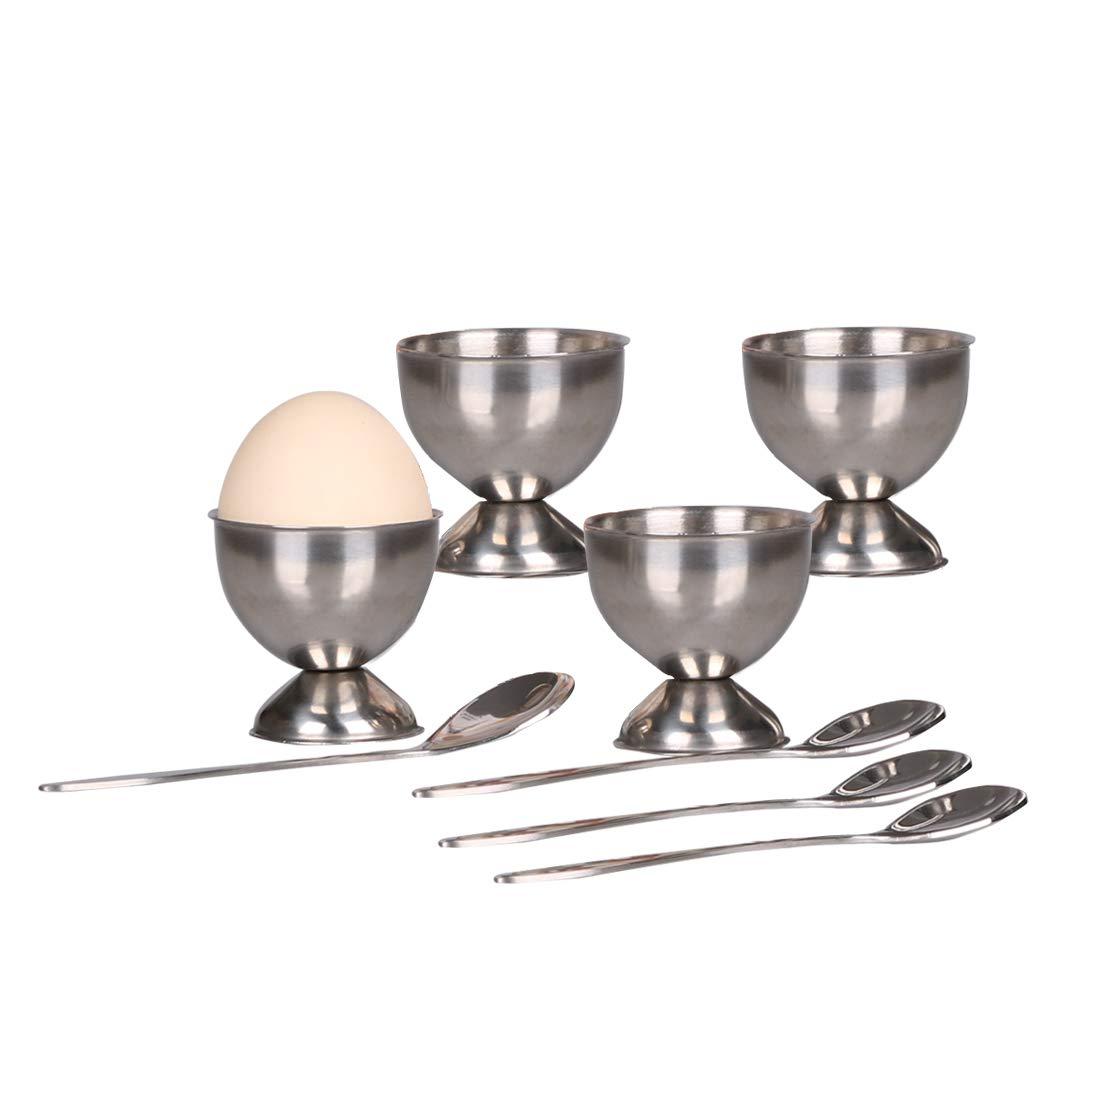 Egg Cups Set Egg Tray for Hard & Soft Boiled Eggs Include 4 Egg Holders, 4 Egg Spoons Stainless Steel Kitchen Tool